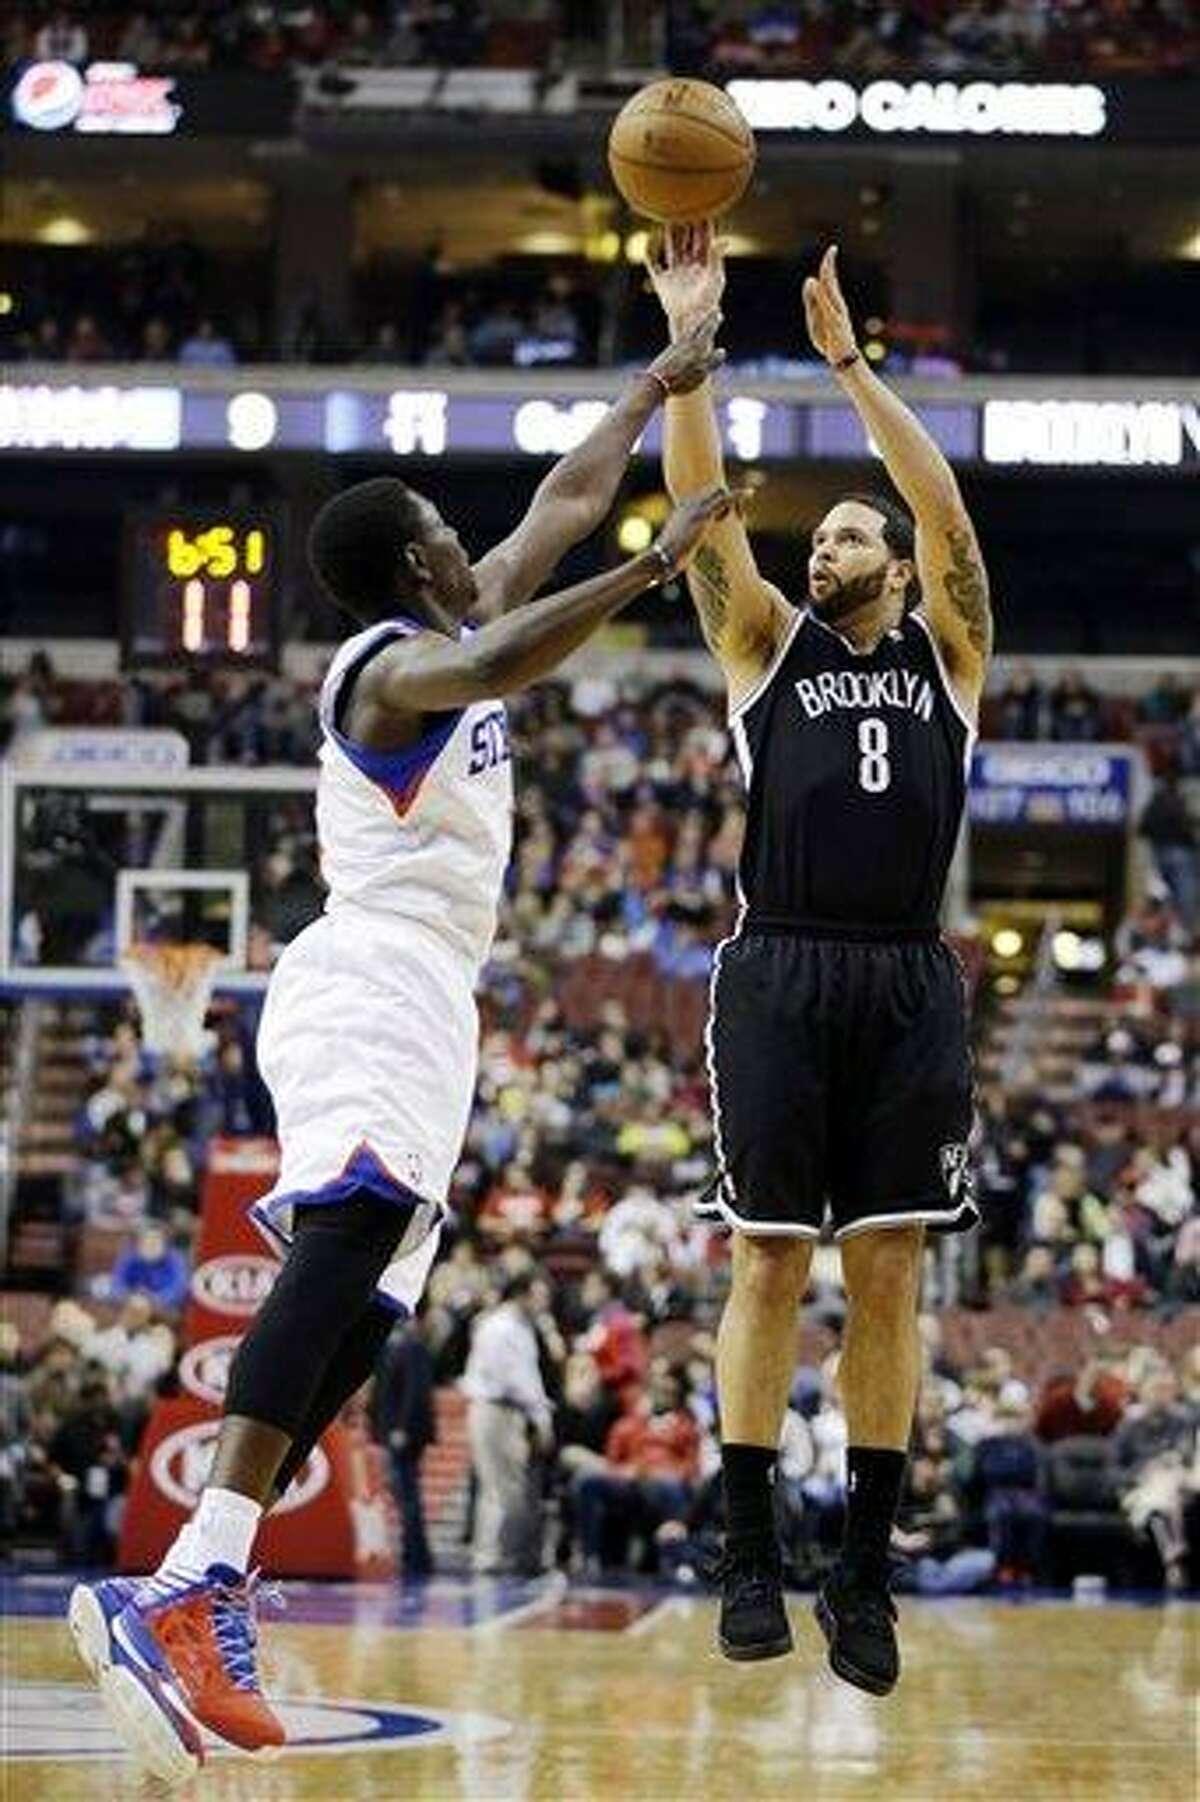 Brooklyn Nets' Deron Williams (8) shoots as Philadelphia 76ers' Jrue Holiday (11) defends in the first half of an NBA basketball game, Tuesday, Jan. 8, 2013, in Philadelphia. Brooklyn won 109-89. (AP Photo/Matt Slocum)